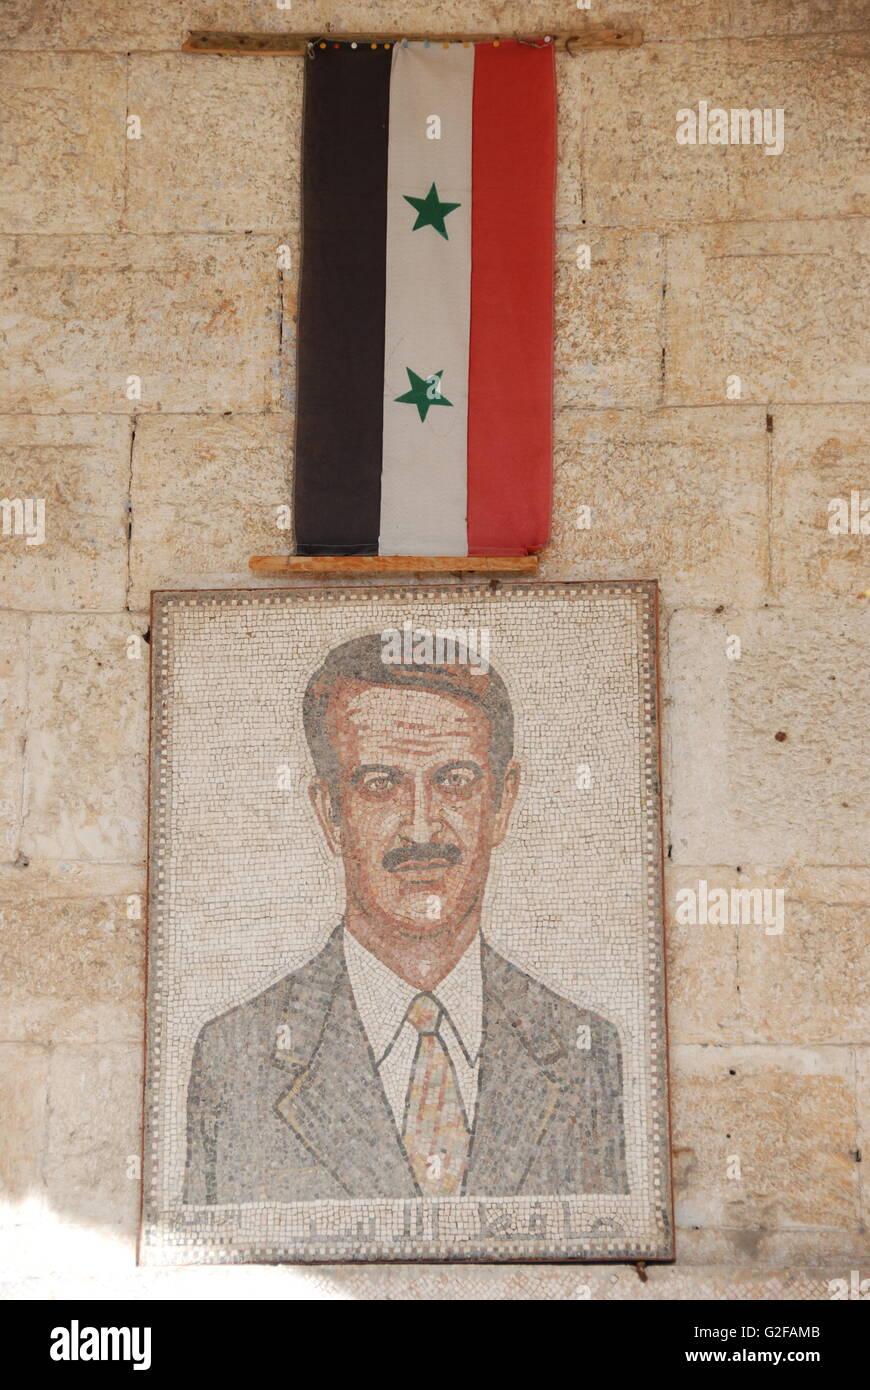 Al-Ma'ara - Mosaics Museum, Mosaic Portrait Of President Hafez al-Assad With Syrian Flag - Stock Image